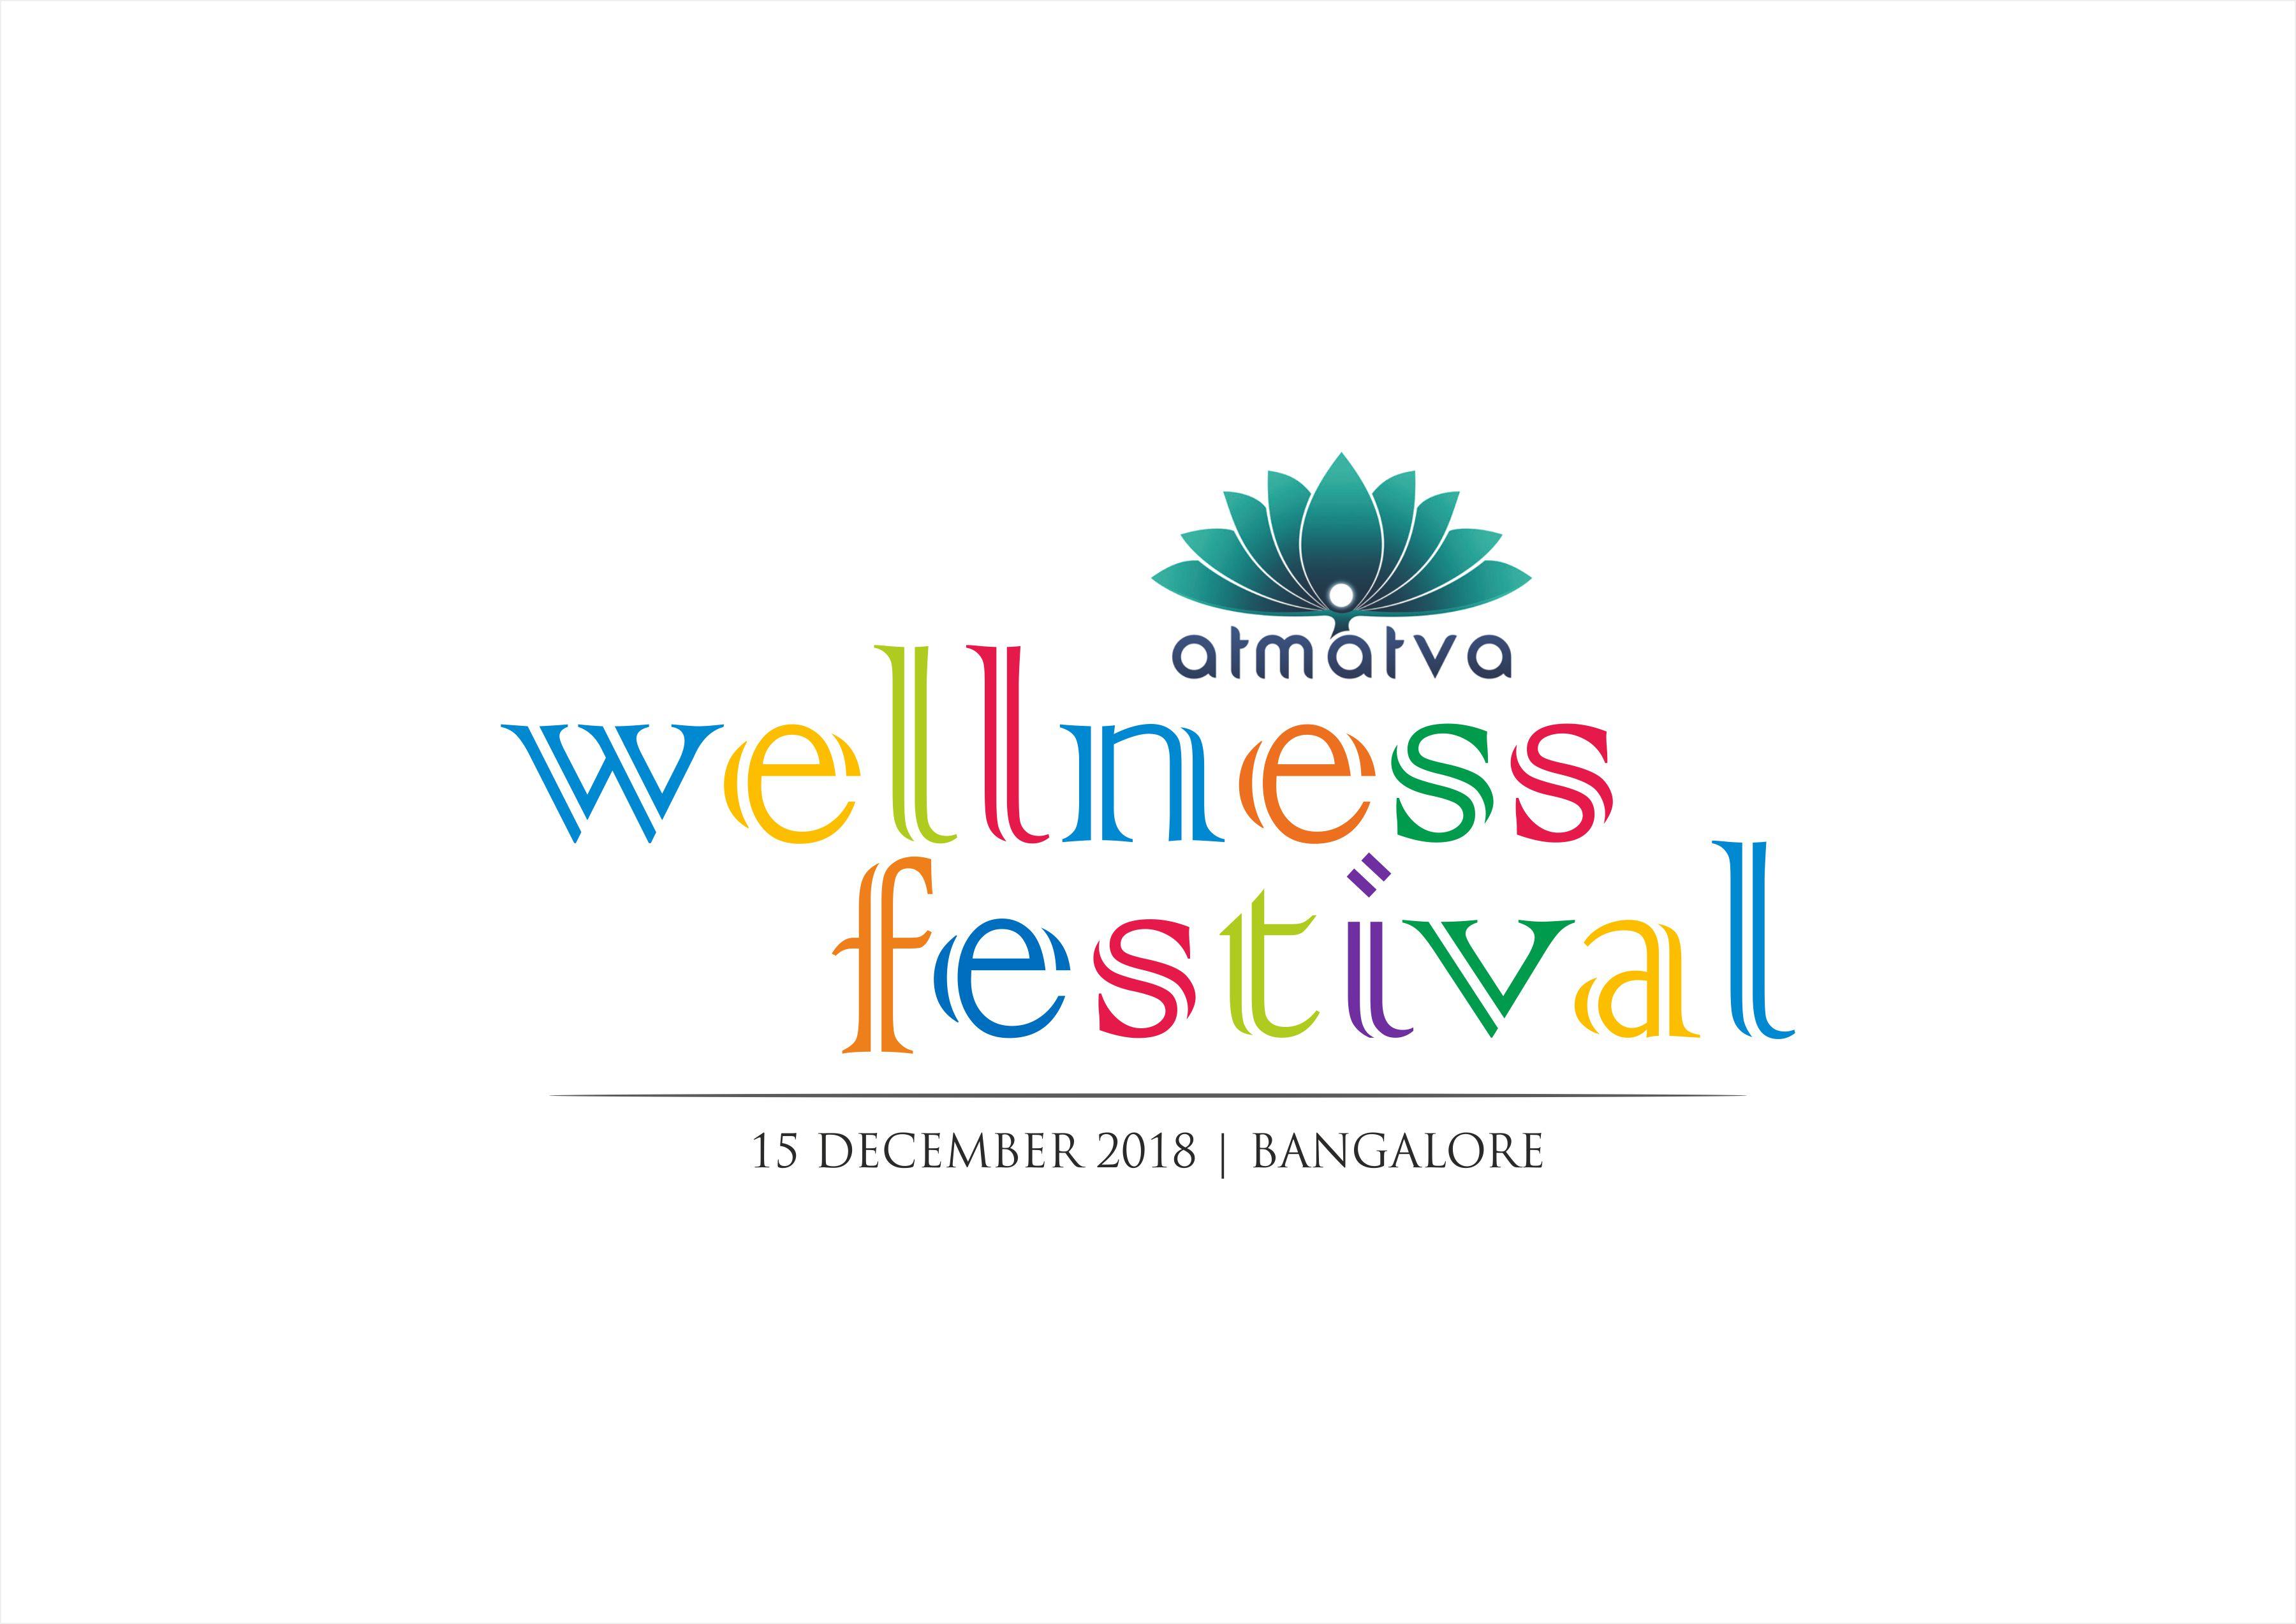 ATMATVA Wellness Festival